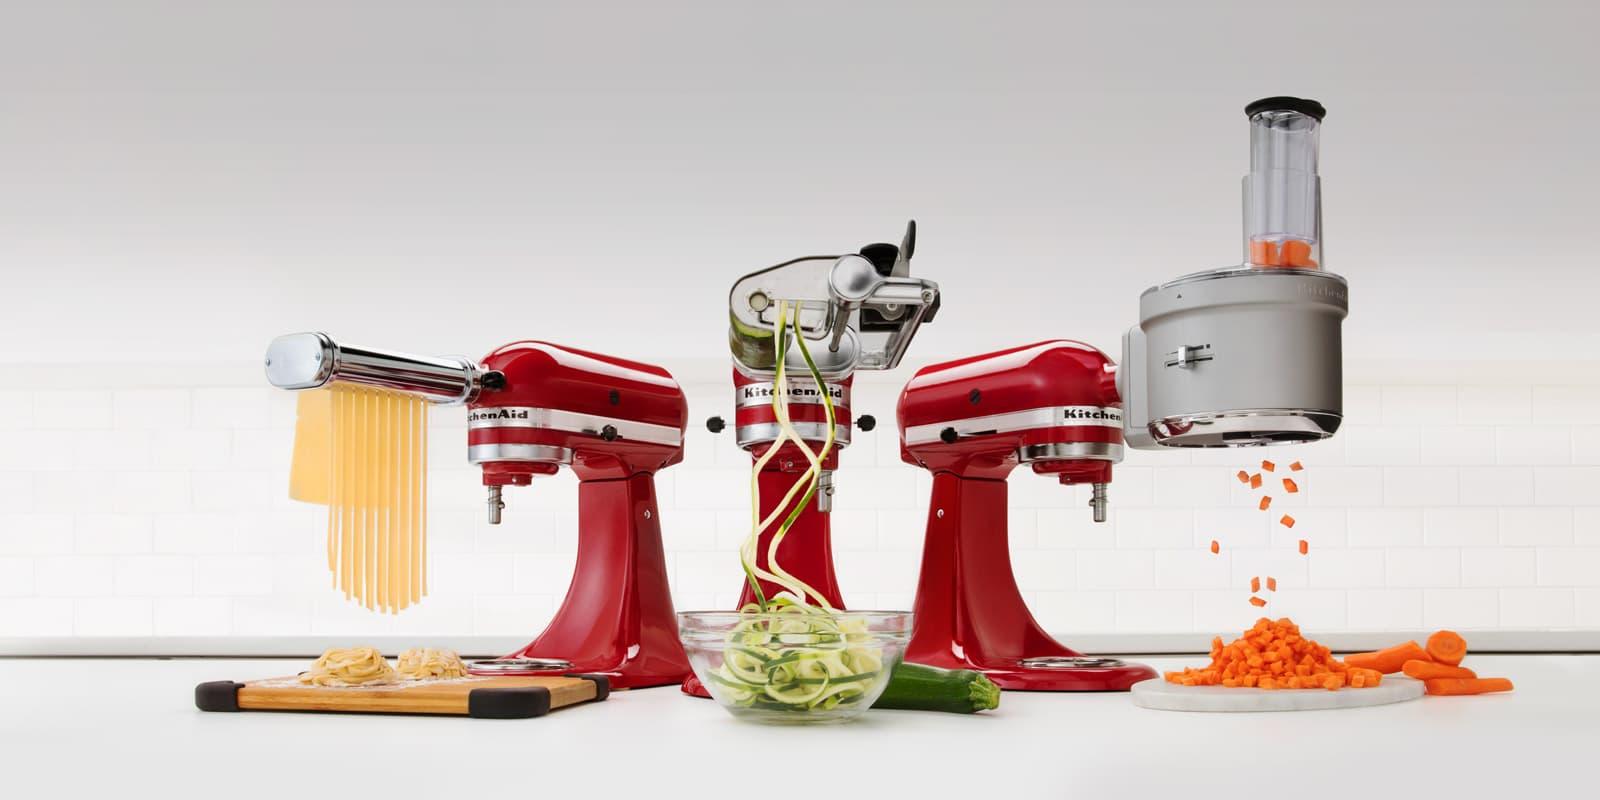 4 8 l artisan stand mixer 5ksm125 kitchenaid uk. Black Bedroom Furniture Sets. Home Design Ideas